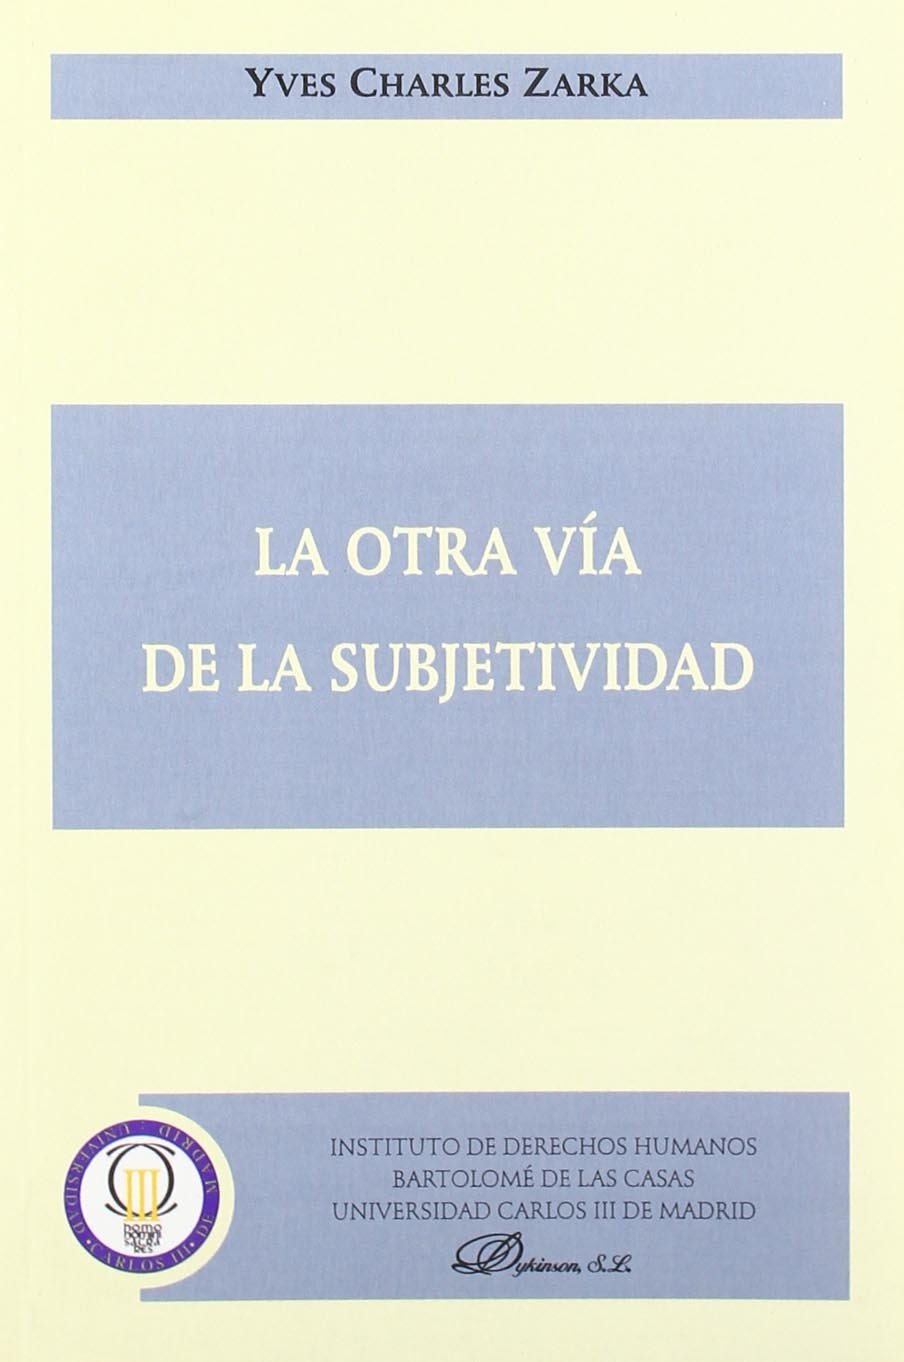 La Otra Vía De La Subjetividad (Spanish Edition) (Spanish) Paperback – April 2, 2008